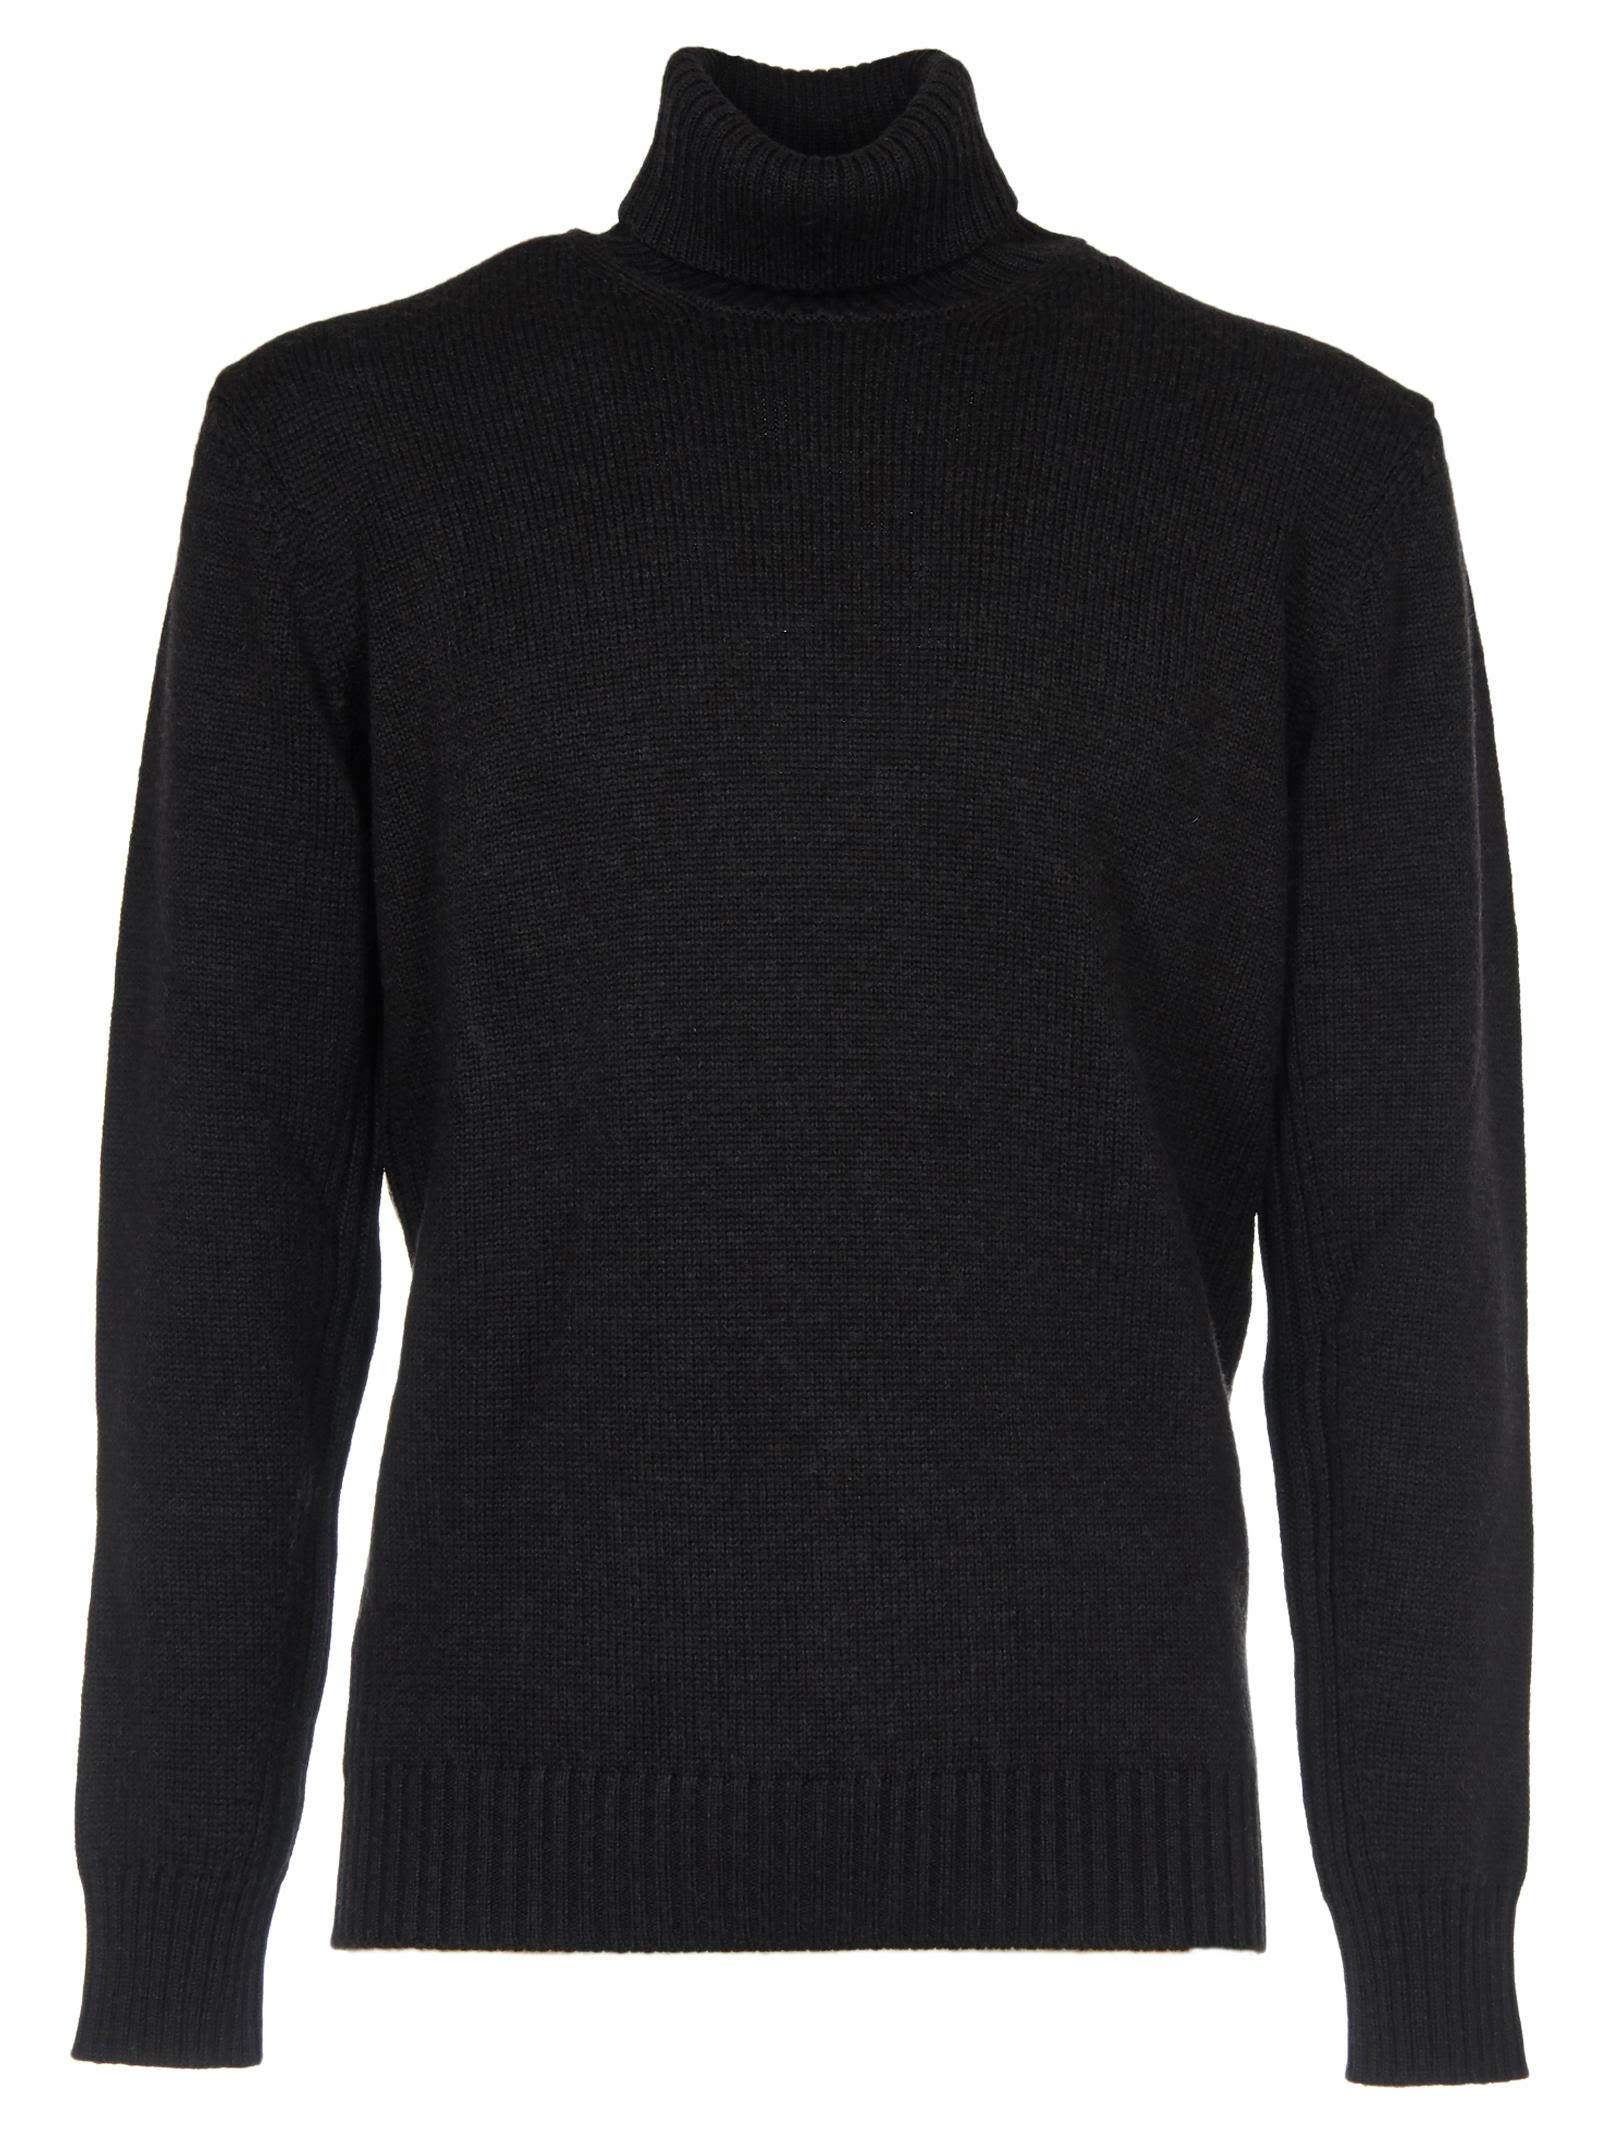 KANGRA Roll Neck Sweater in Coal